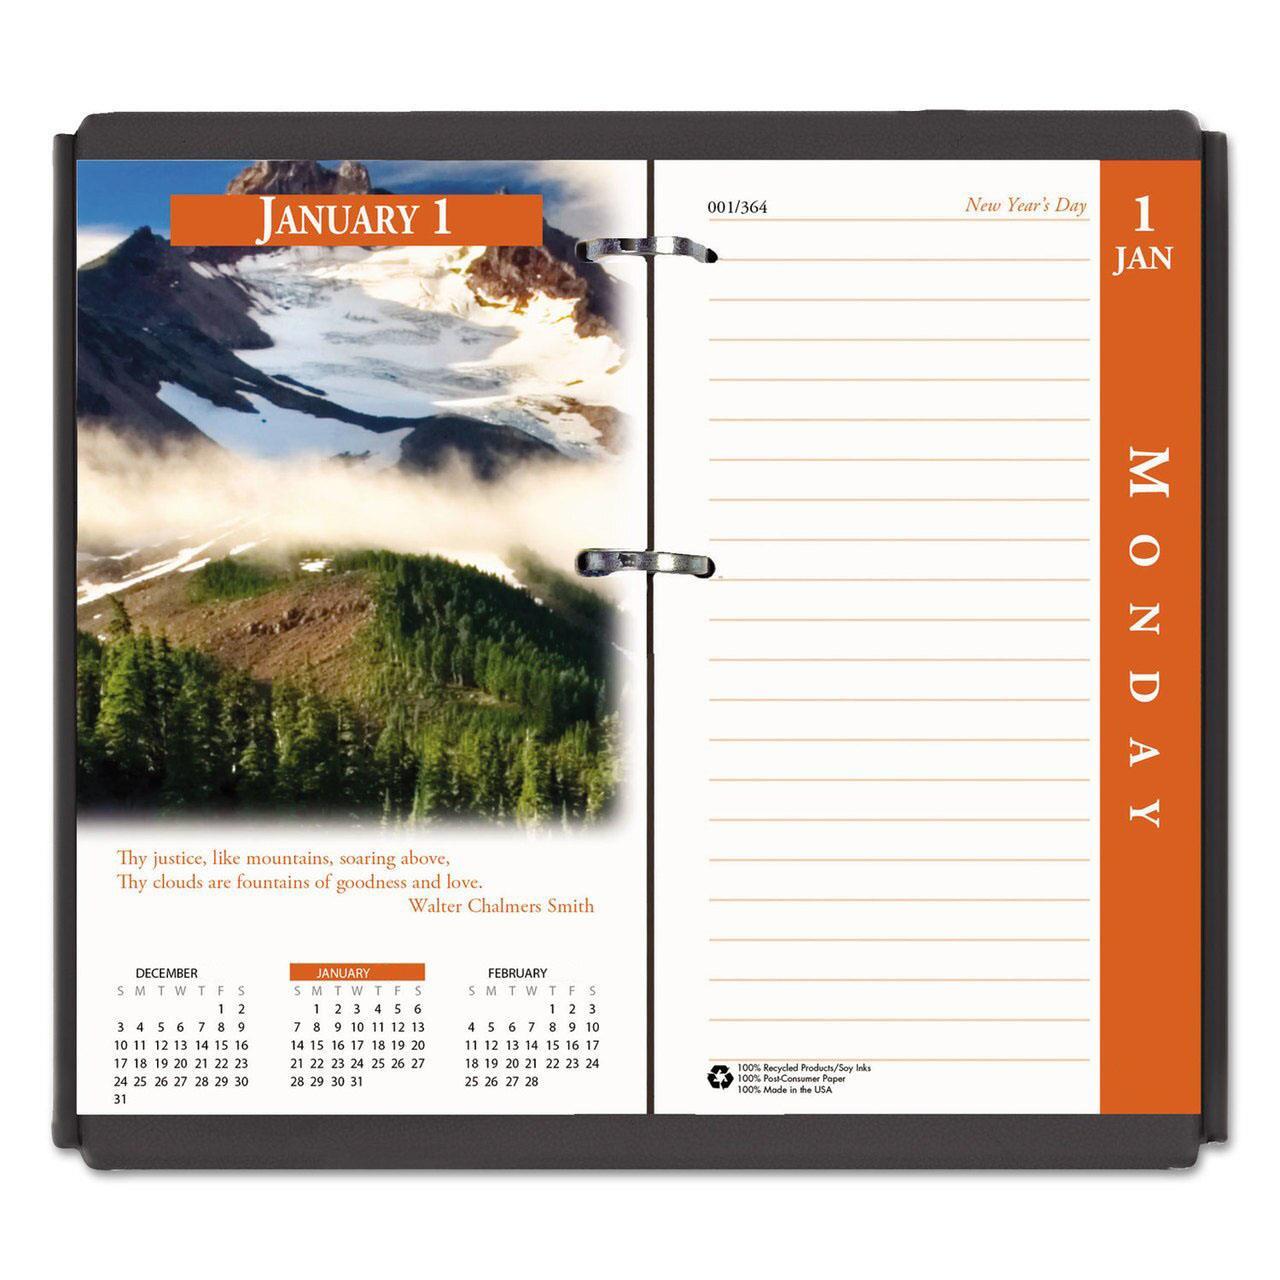 Calendar Refills 2020 Bulk 2020 Desk Calendar Refills, Images, Recycled: HOD417 (9 Desk